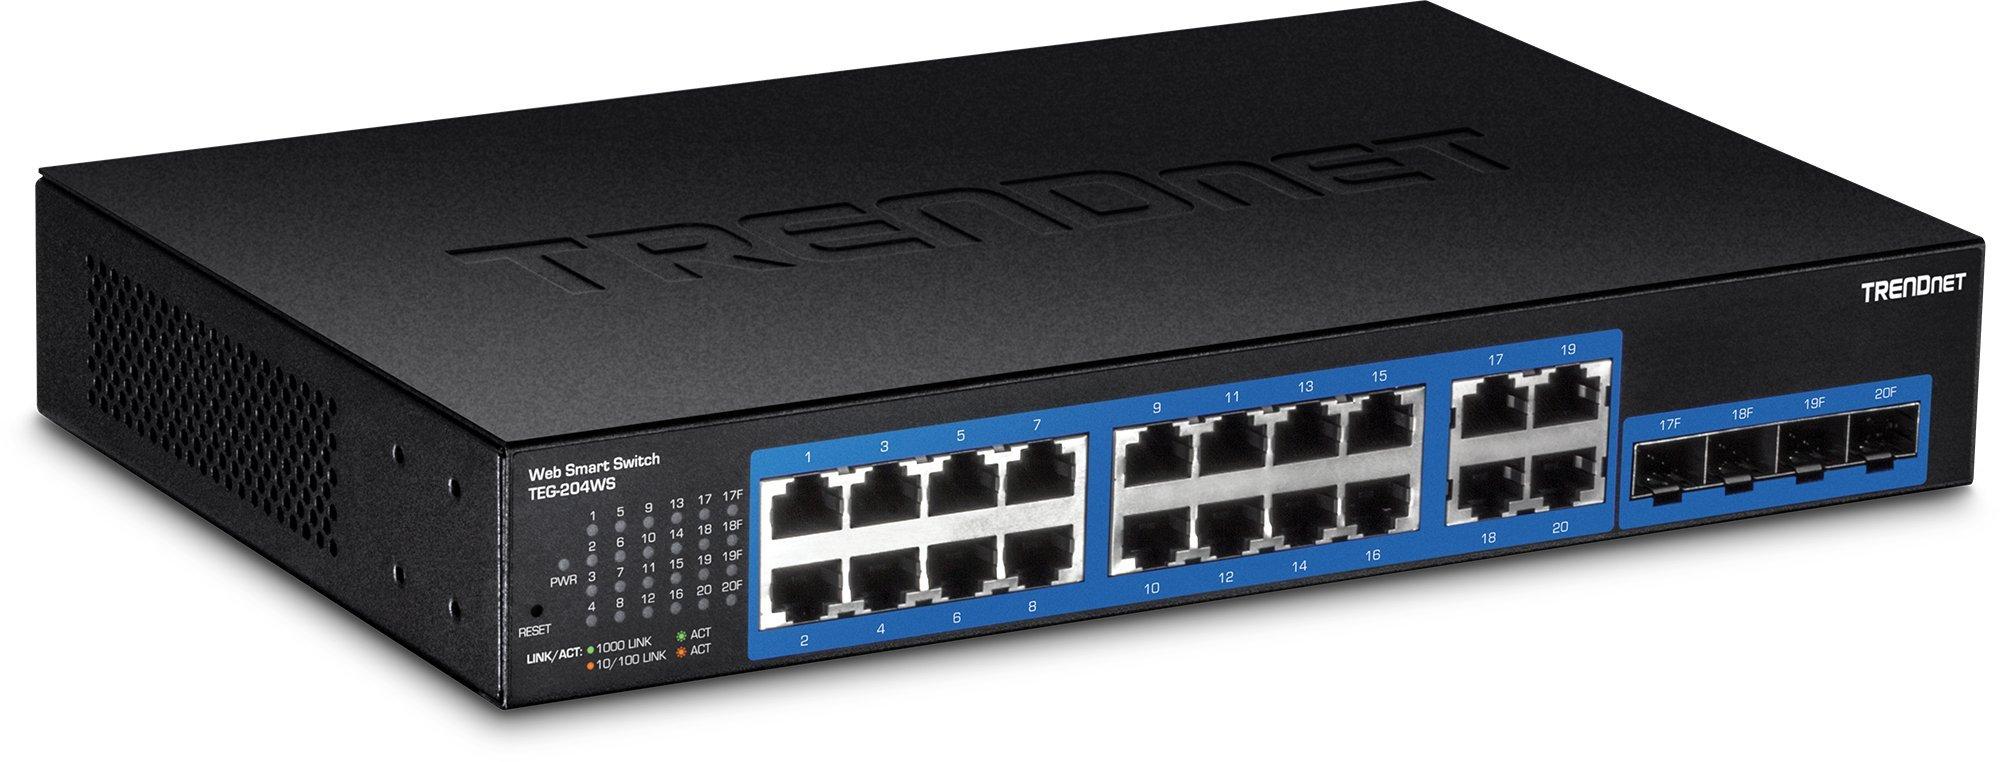 TRENDnet 20-Port Gigabit Web Smart Switch, 16 x Gigabit Ports, 4 x shared Gigabit Ports (RJ-45/SFP), VLAN, QoS, LACP, IPv6 Support, 40 Gbps Switching Capacity, TEG-204WS